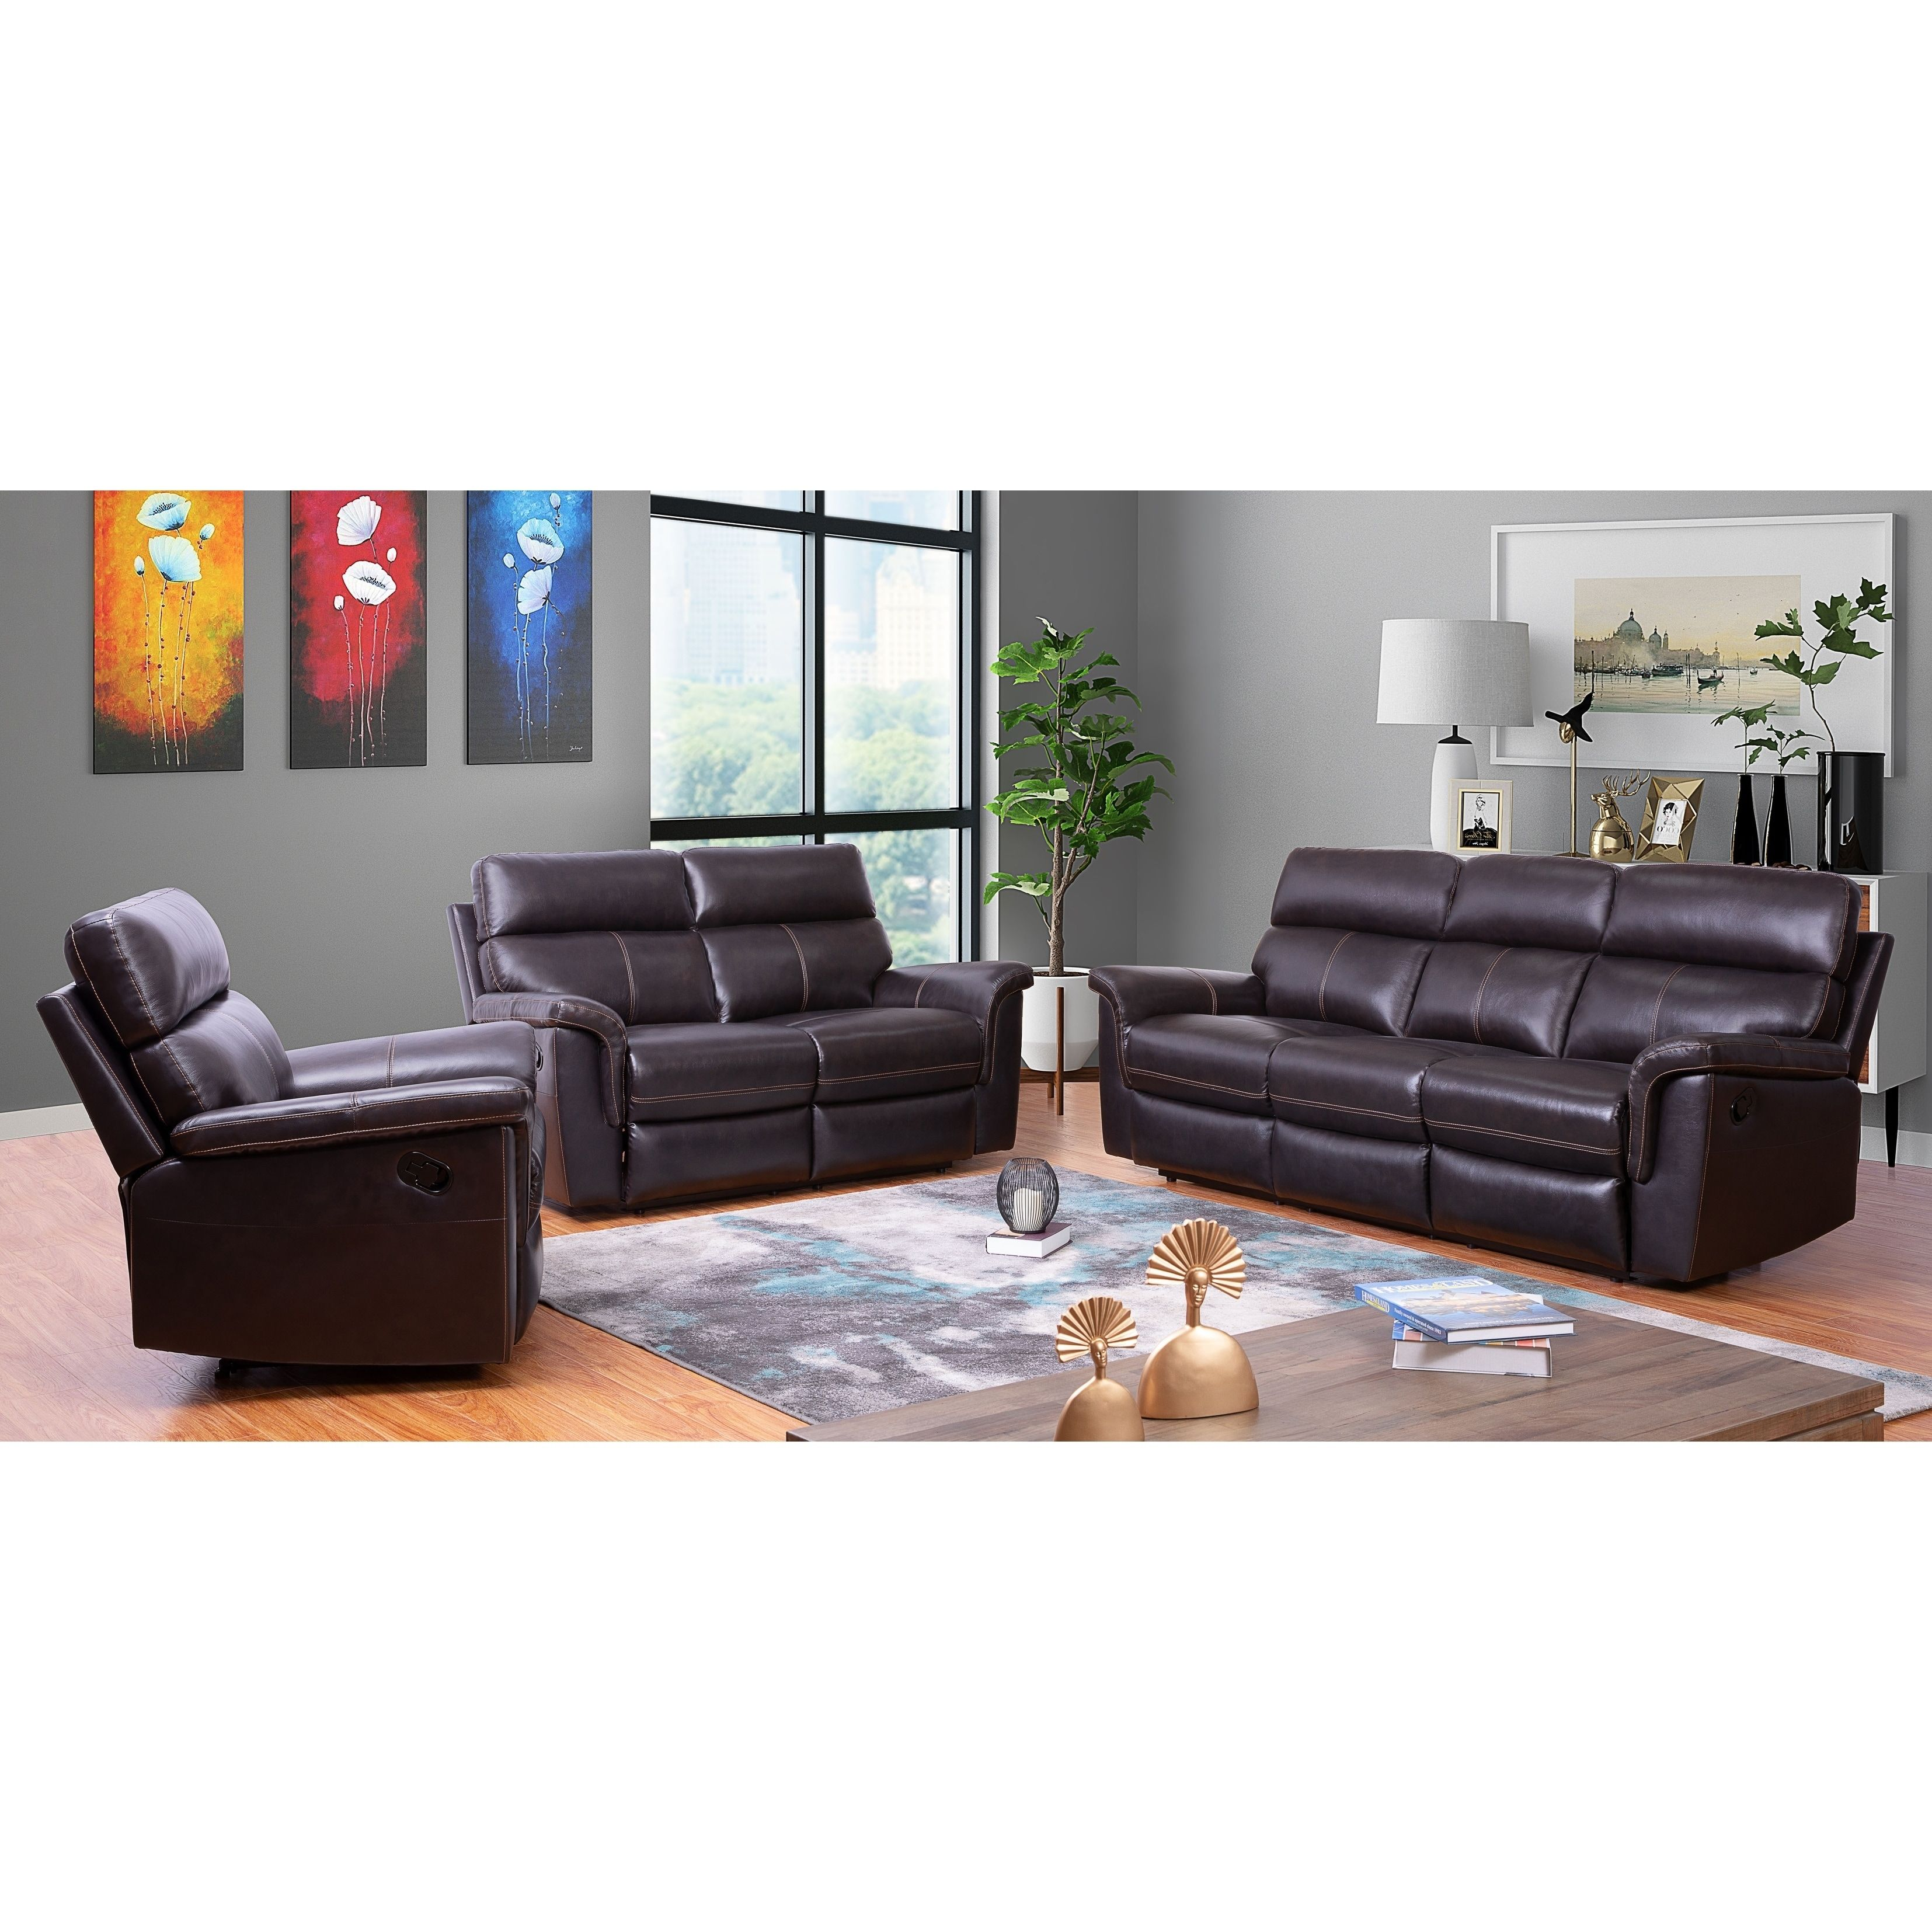 Miraculous Abbyson Wellington Top Grainleather Brown Recliner Sofa Set Machost Co Dining Chair Design Ideas Machostcouk